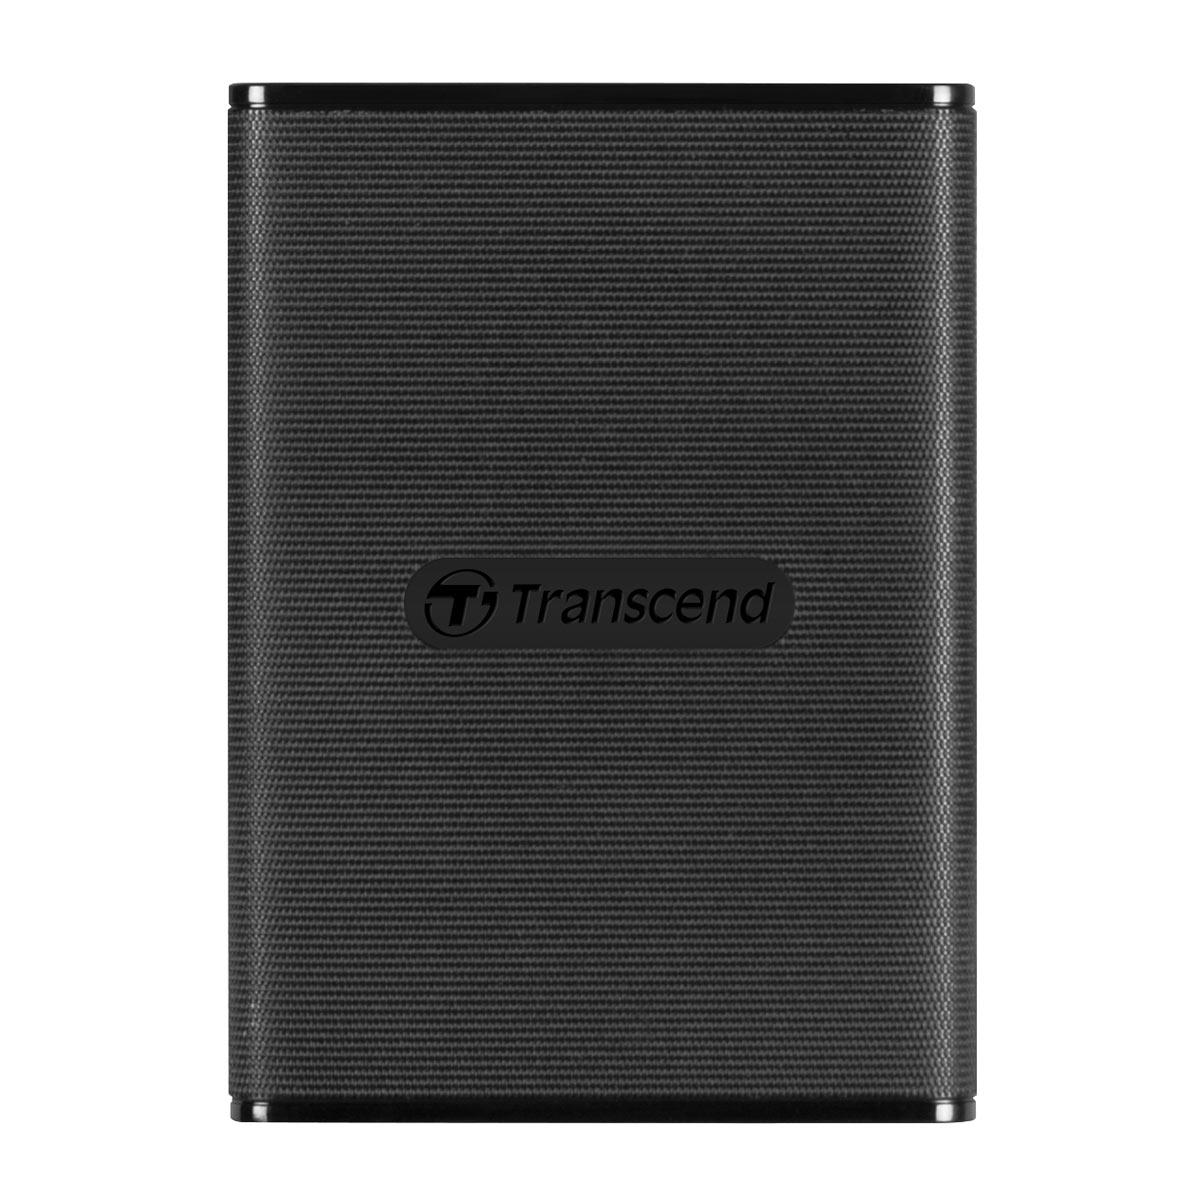 Transcend ポータブルSSD 960GB ESD230C USB3.1 Gen2対応[TS960GESD230C]【送料無料】